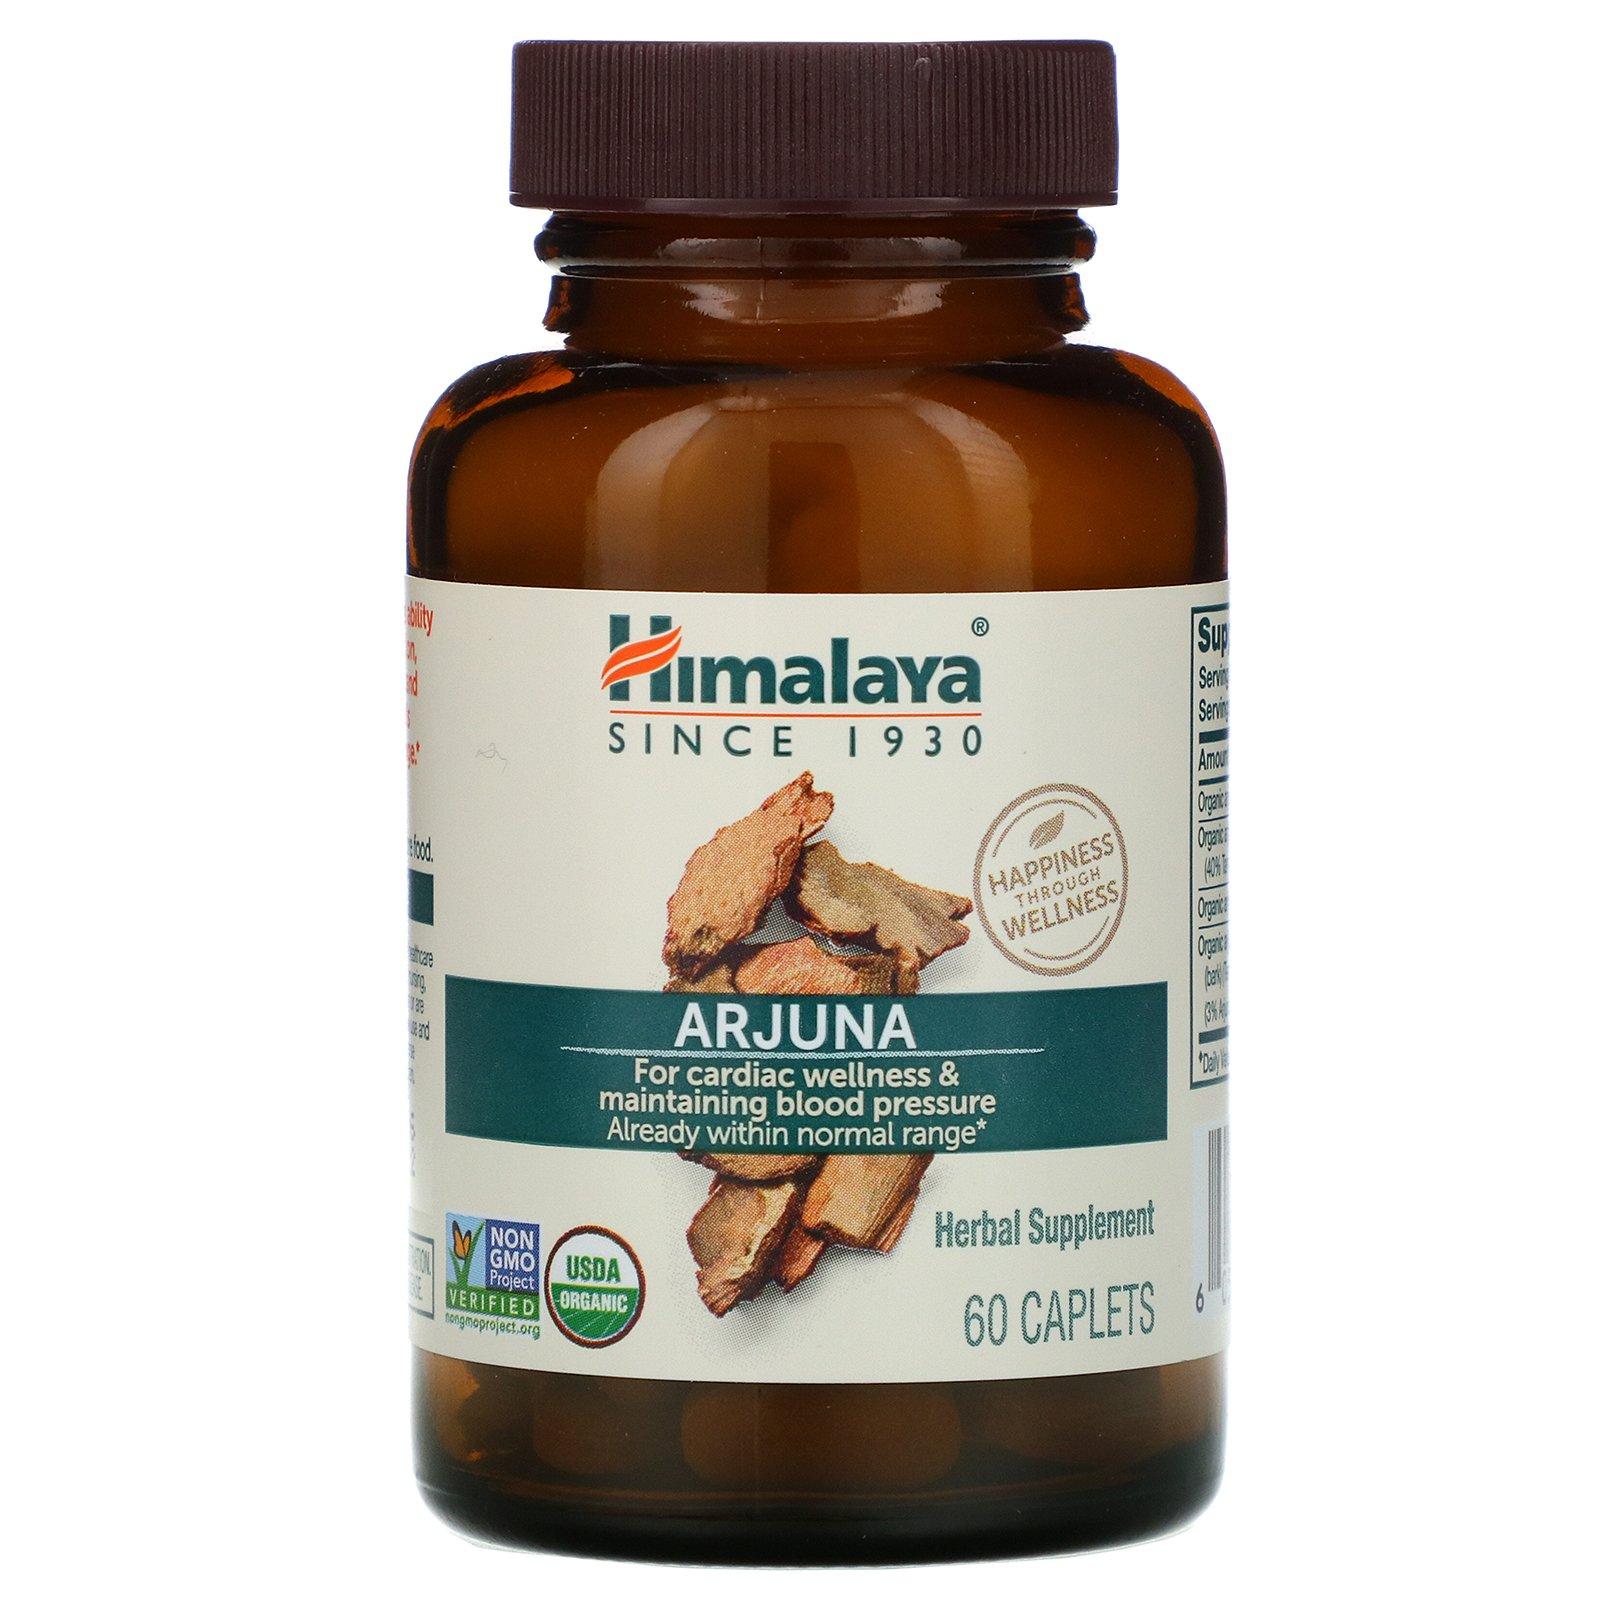 asthalin ax syrup price